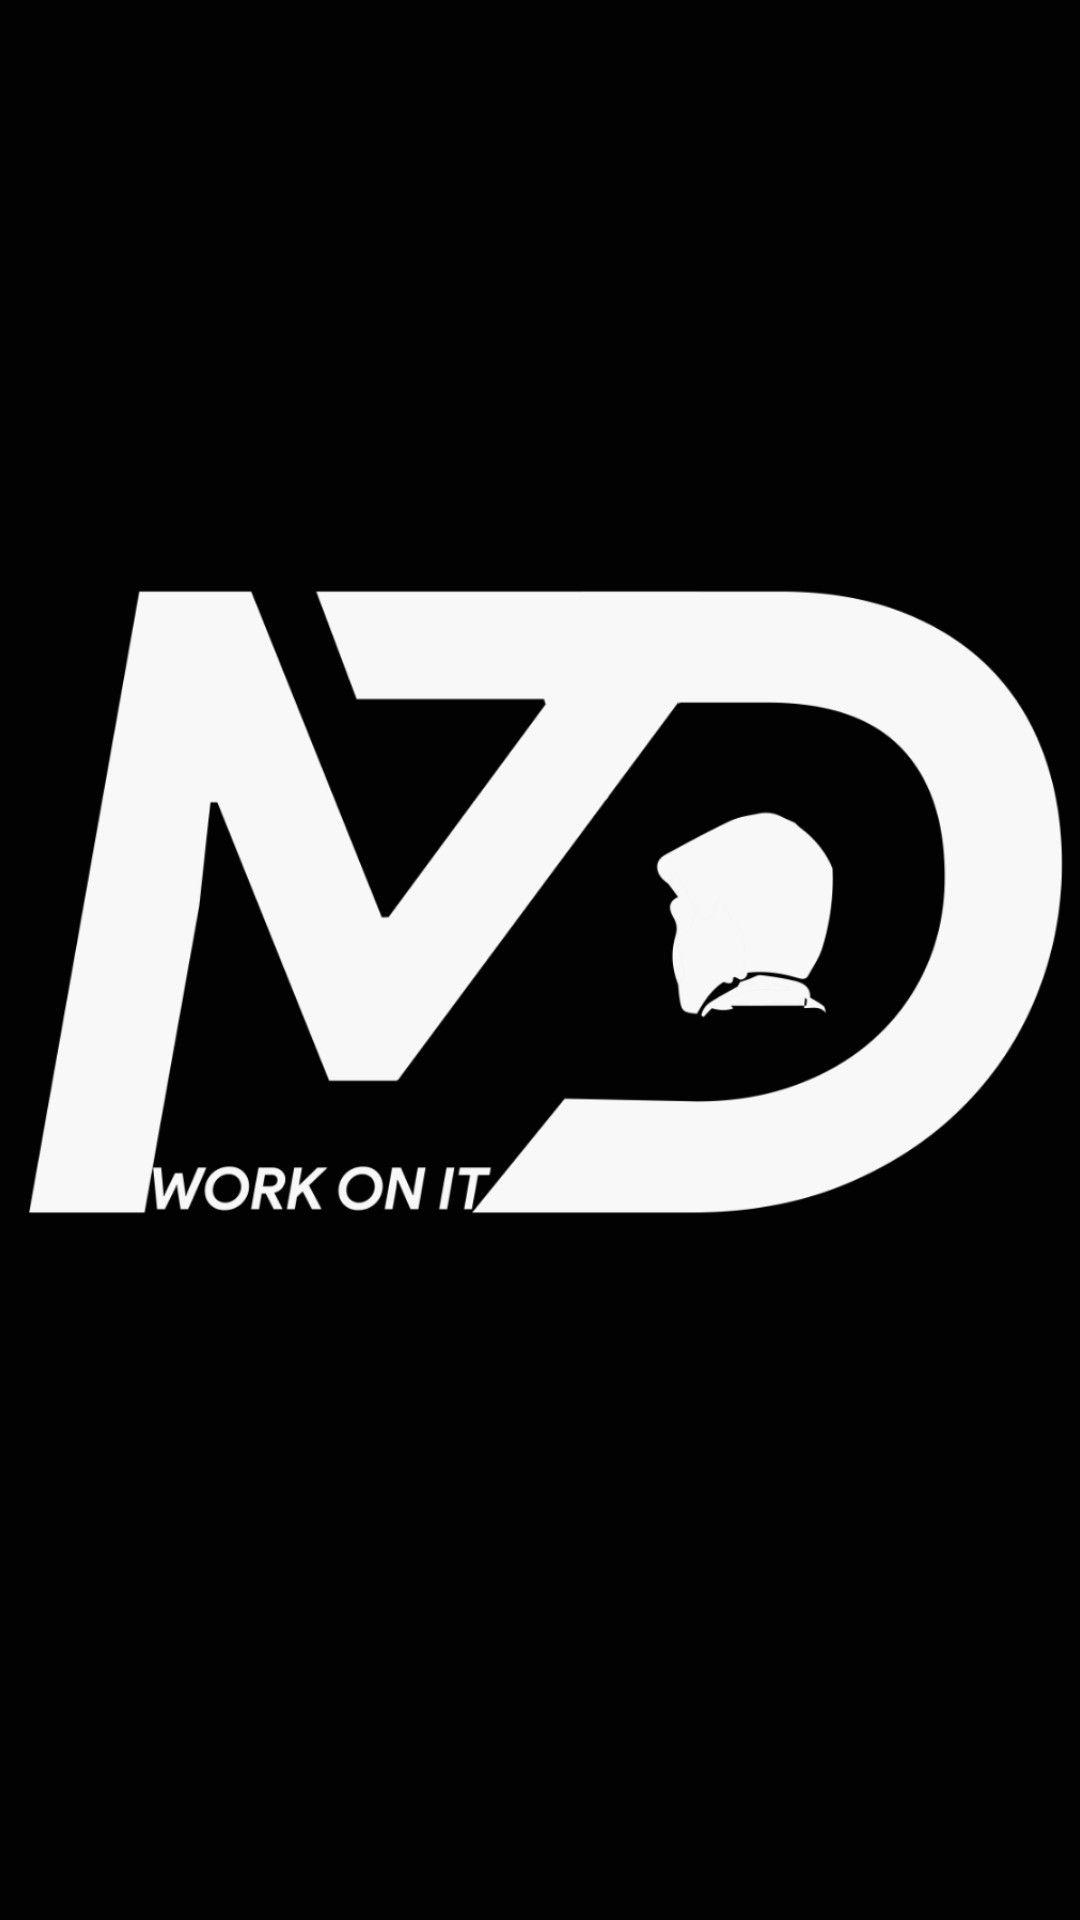 Md7 Logo Motivation Work On It Muralidhar Durgasi Logos Letter Logo Logo Design